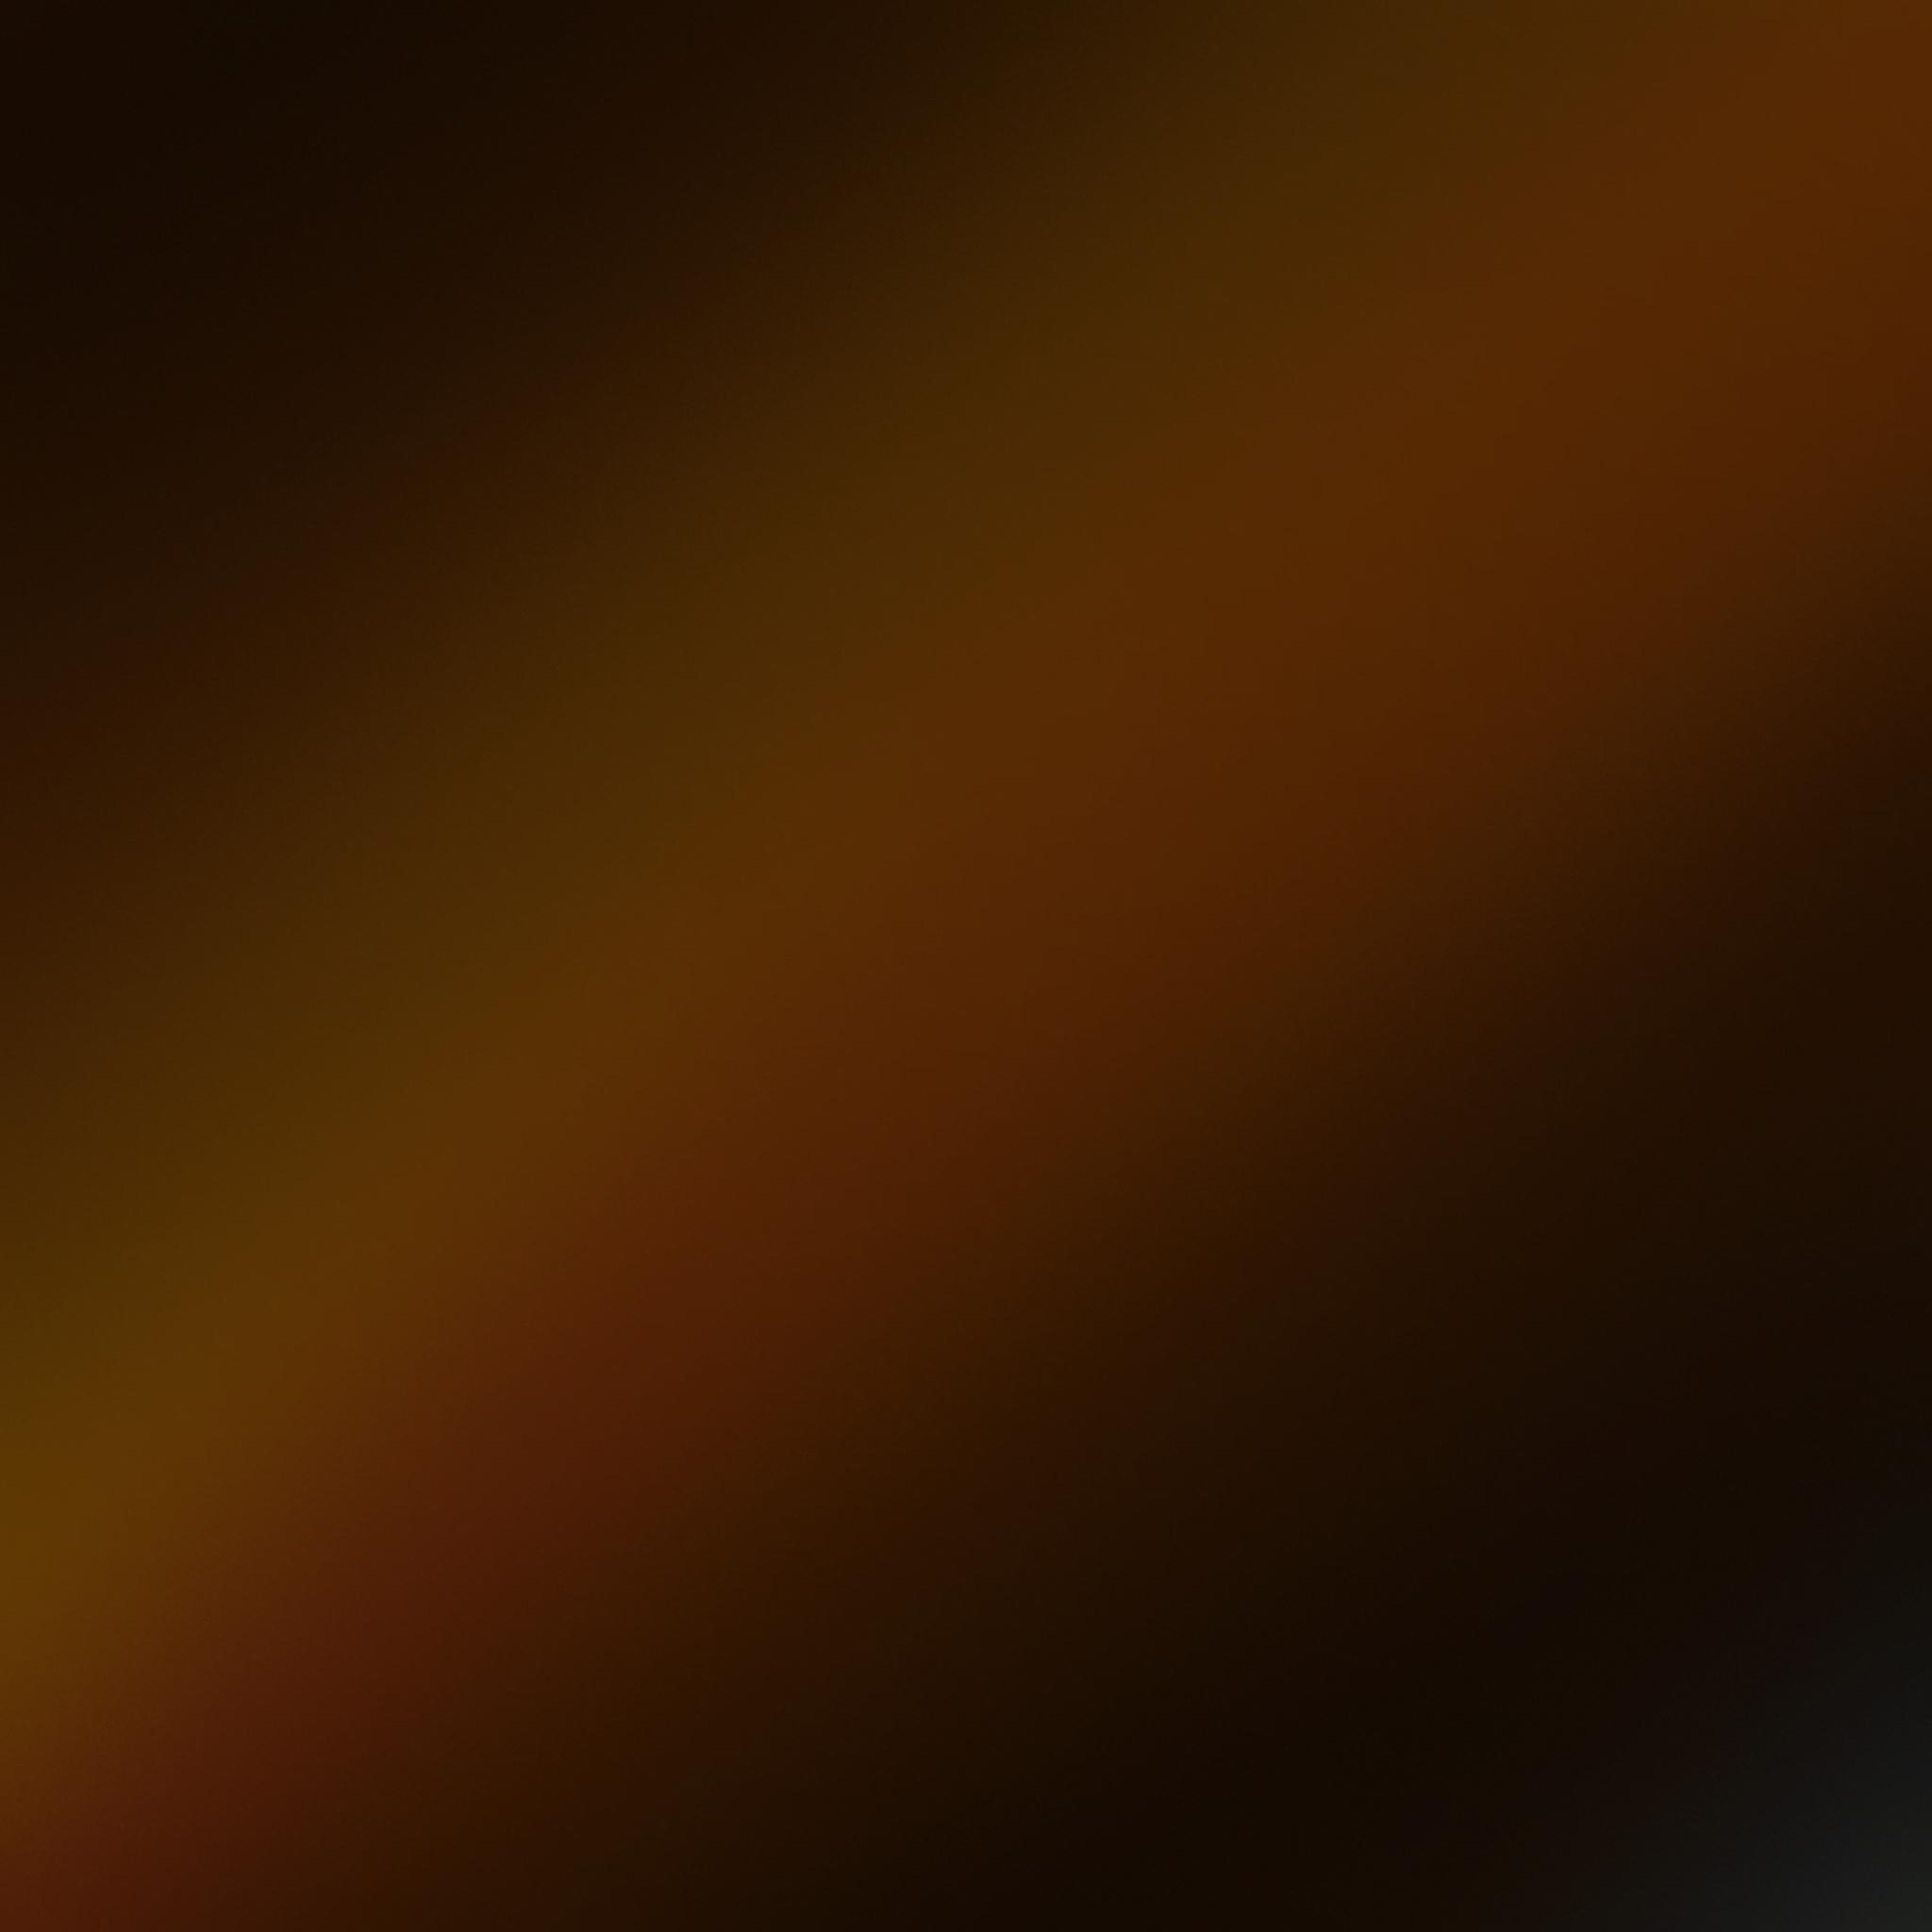 Must see Wallpaper Home Screen Xperia - Galaxy-s9-wallpaper-6-techfoogle  HD_449824.png?w\u003d300